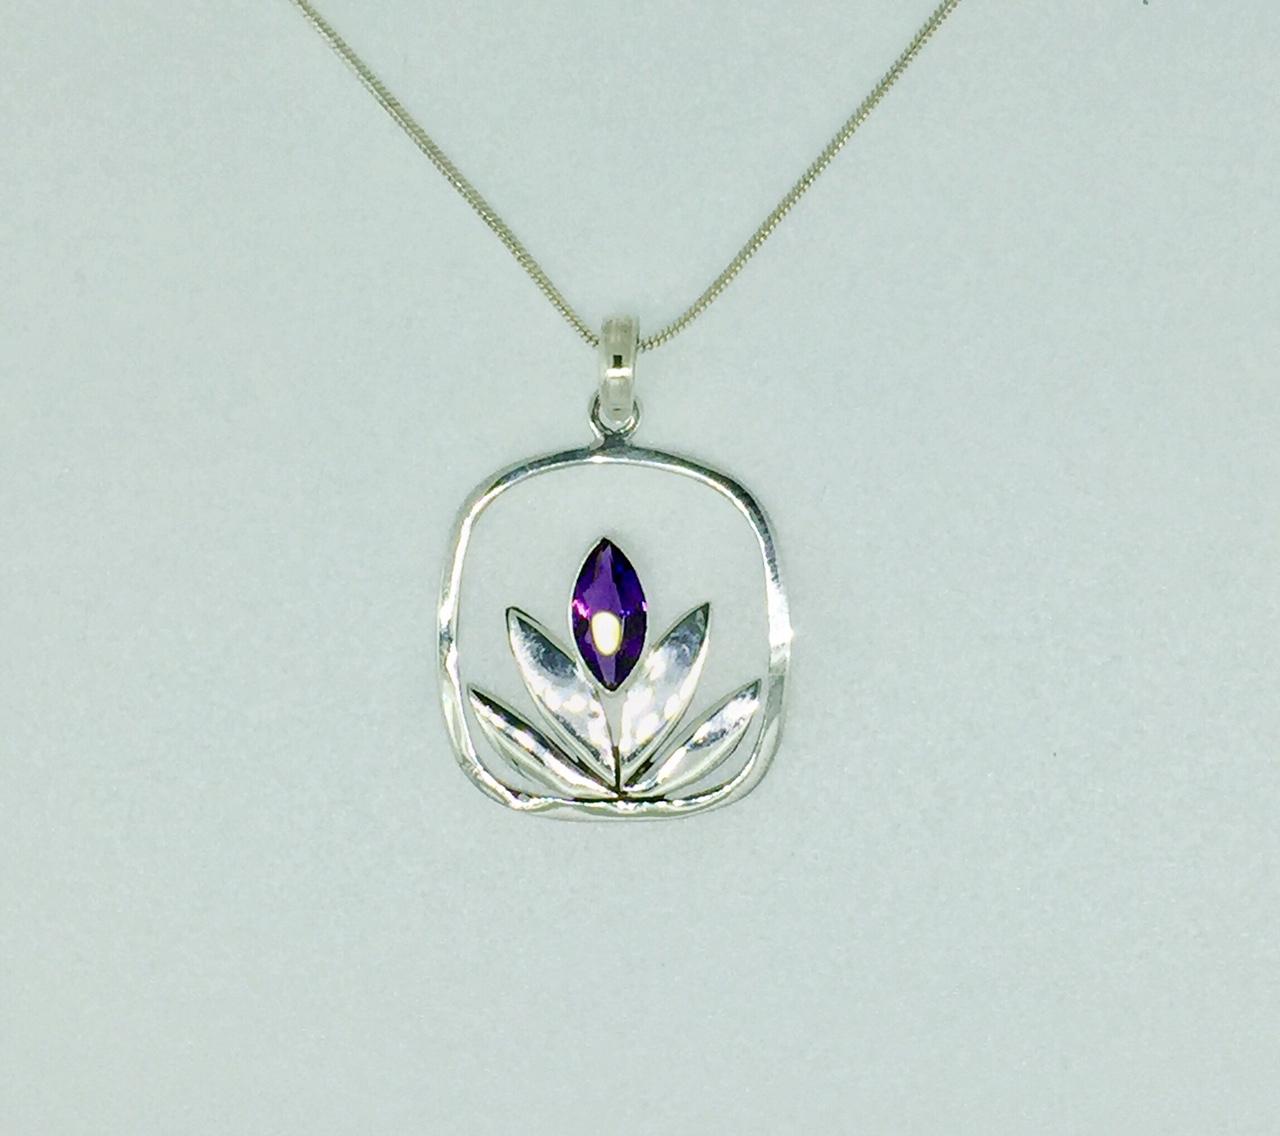 6e57fa438 Amethyst Lotus Flower Sterling Silver Necklace - Mima's Of Warwick, LLC